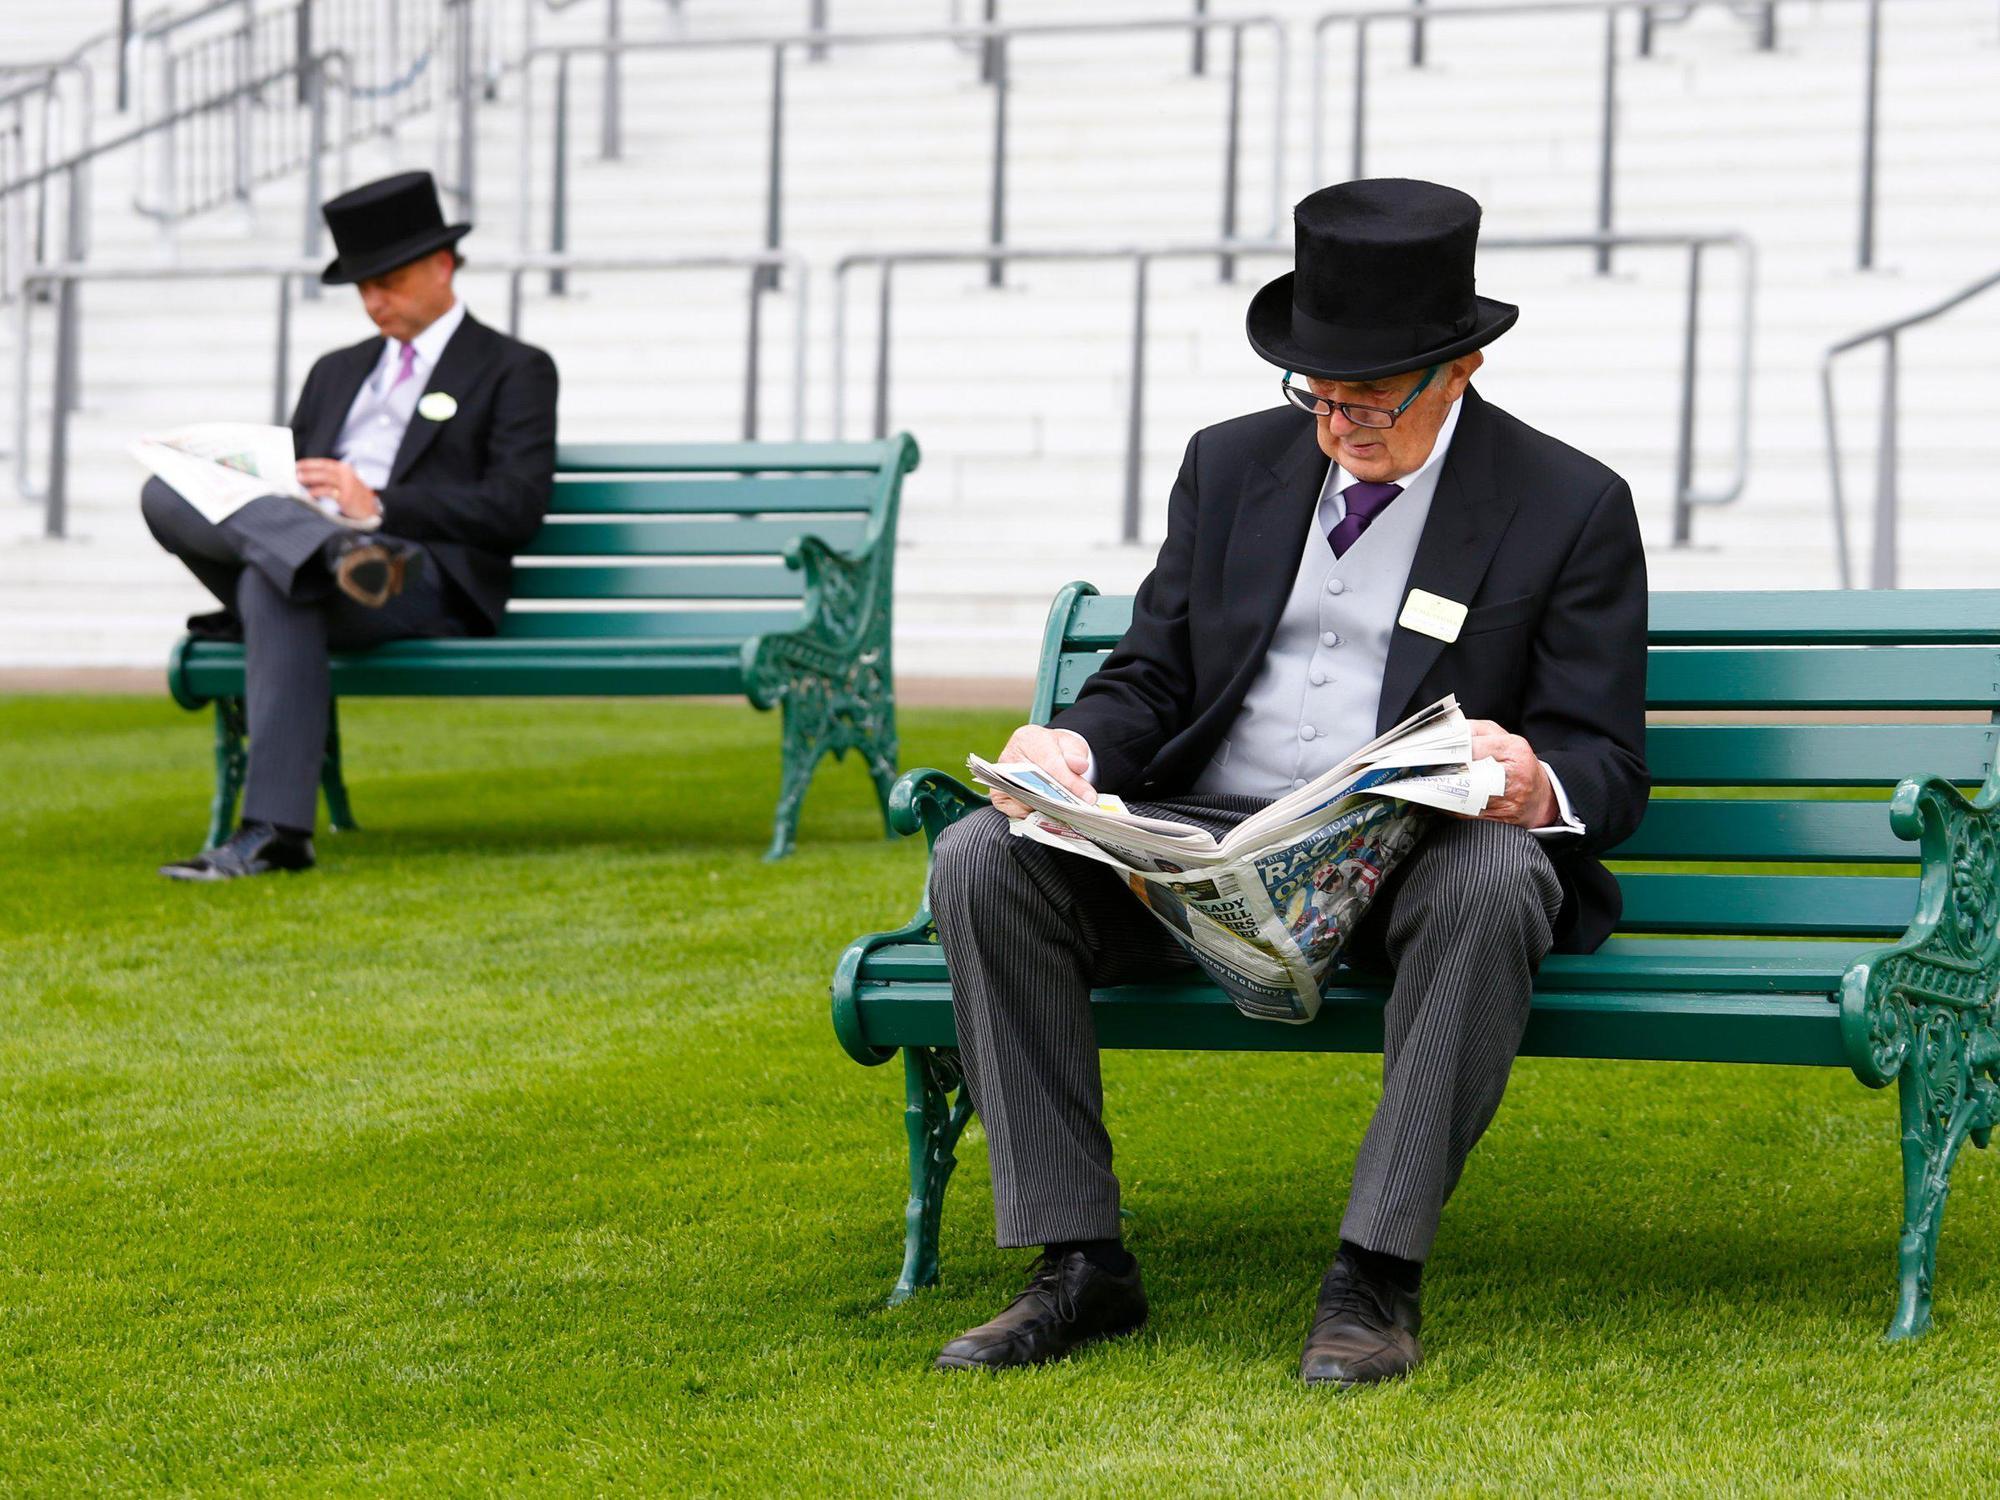 STOCK Horse Racing - Royal Ascot - Ascot Racecourse - A racegoer reads the newspaper,